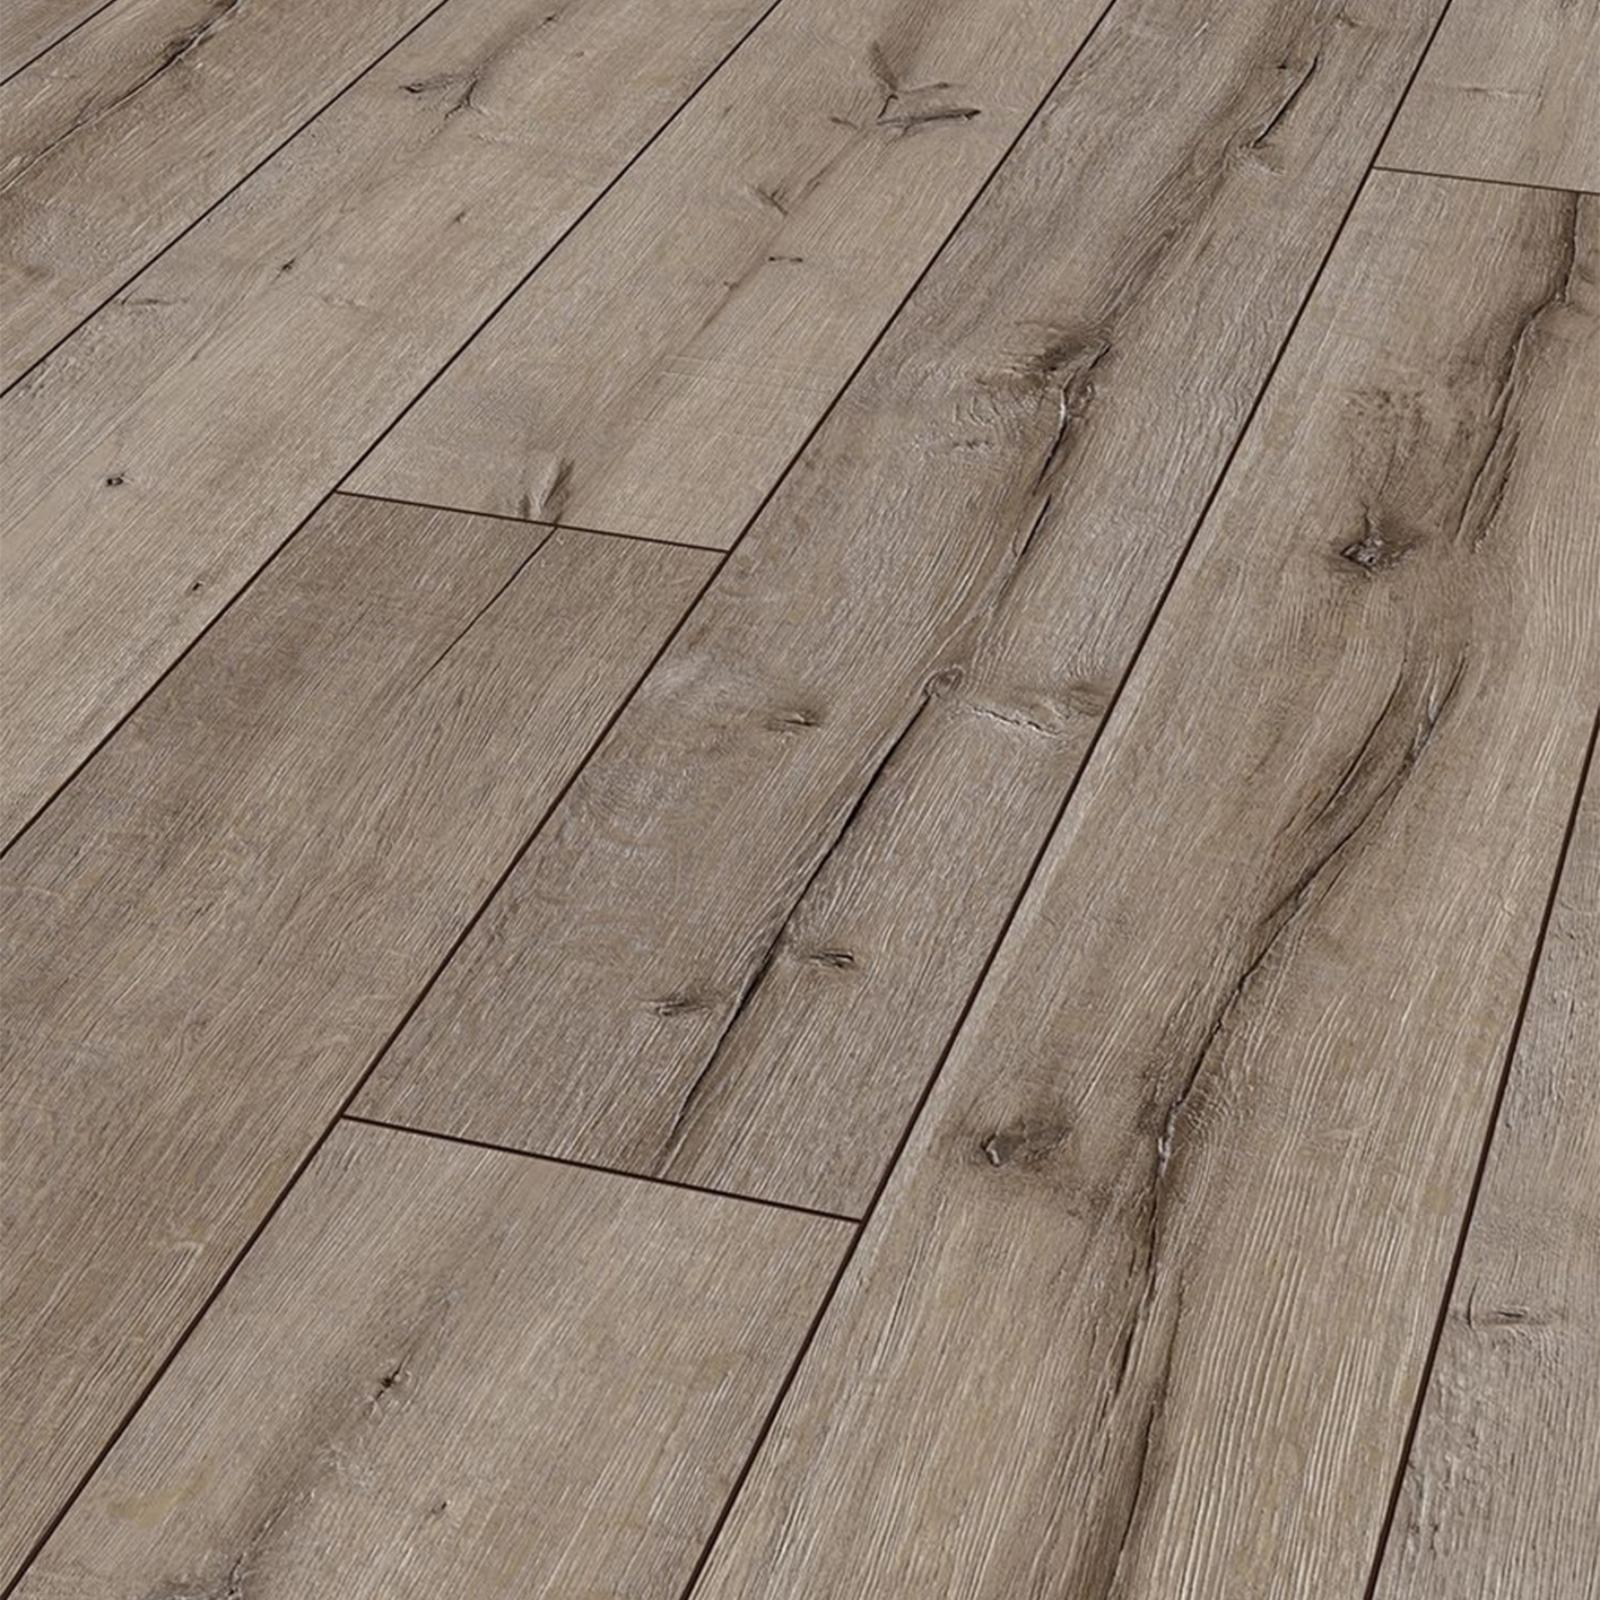 Laminat Boden Holzboden Klick Profi Royal Mit V